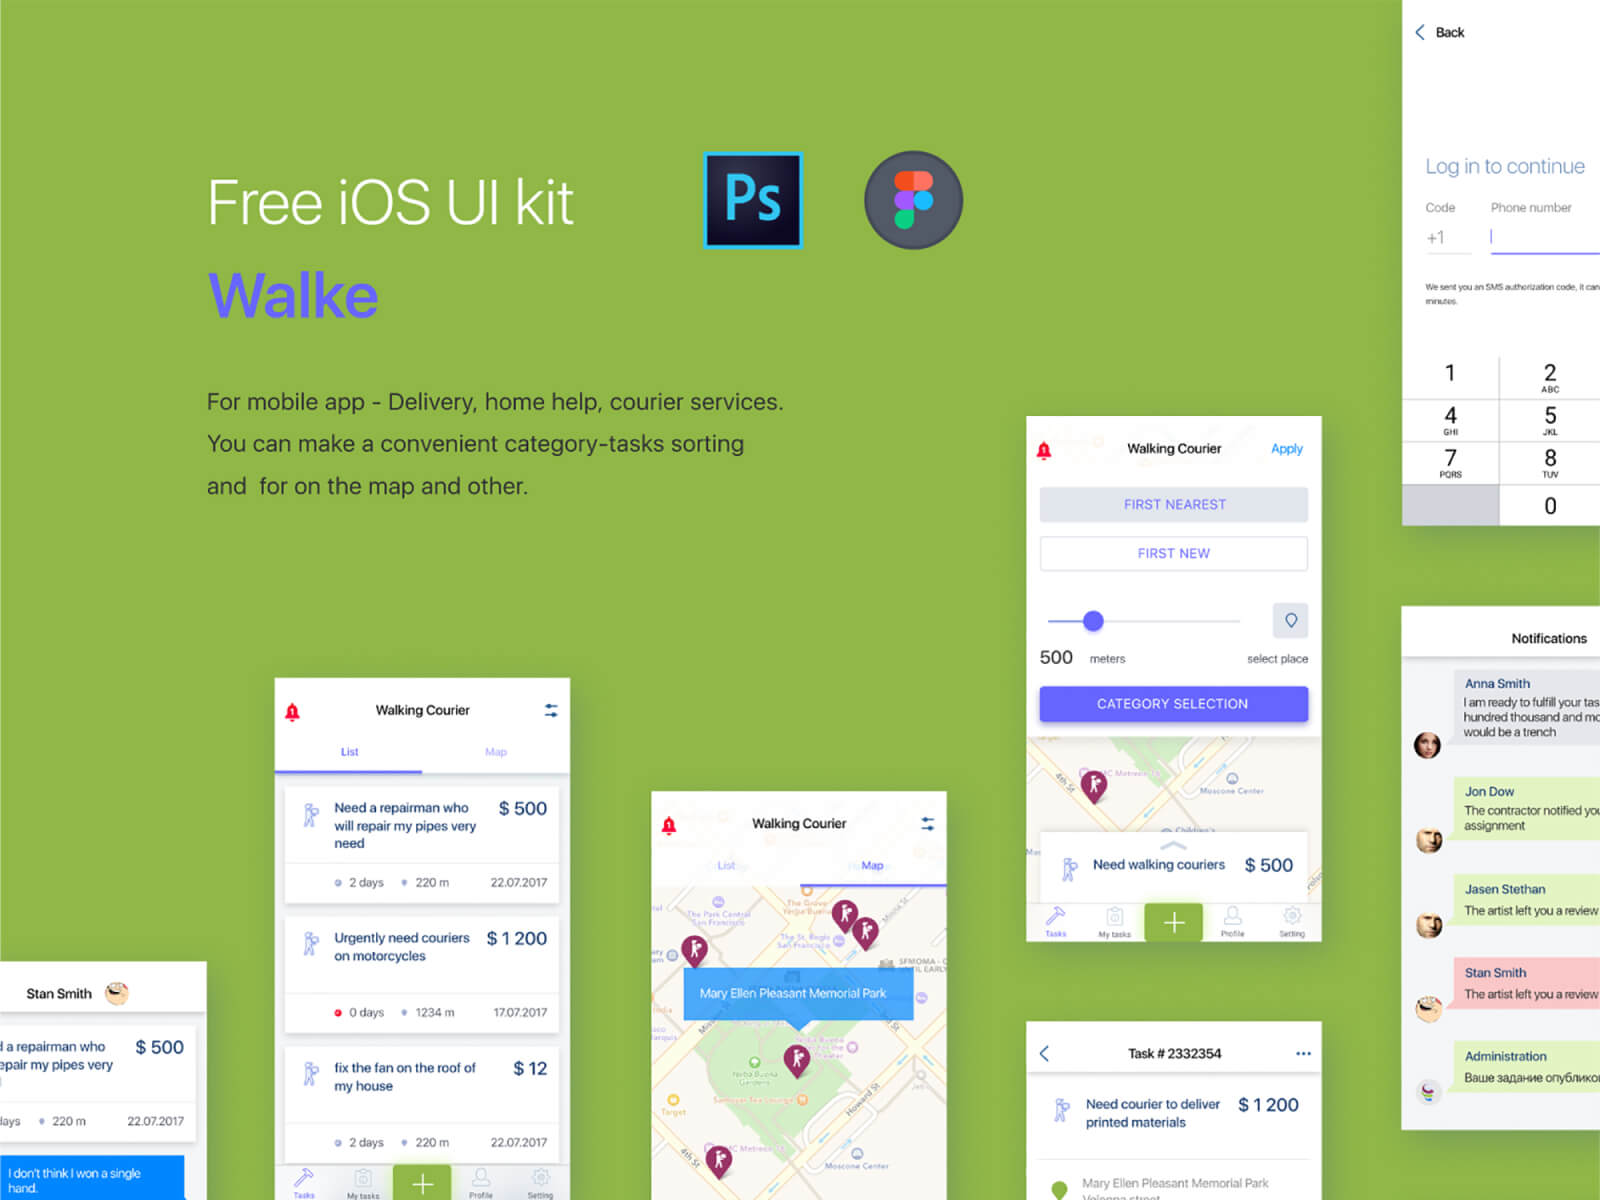 Walke. FREE iOS kit cover image